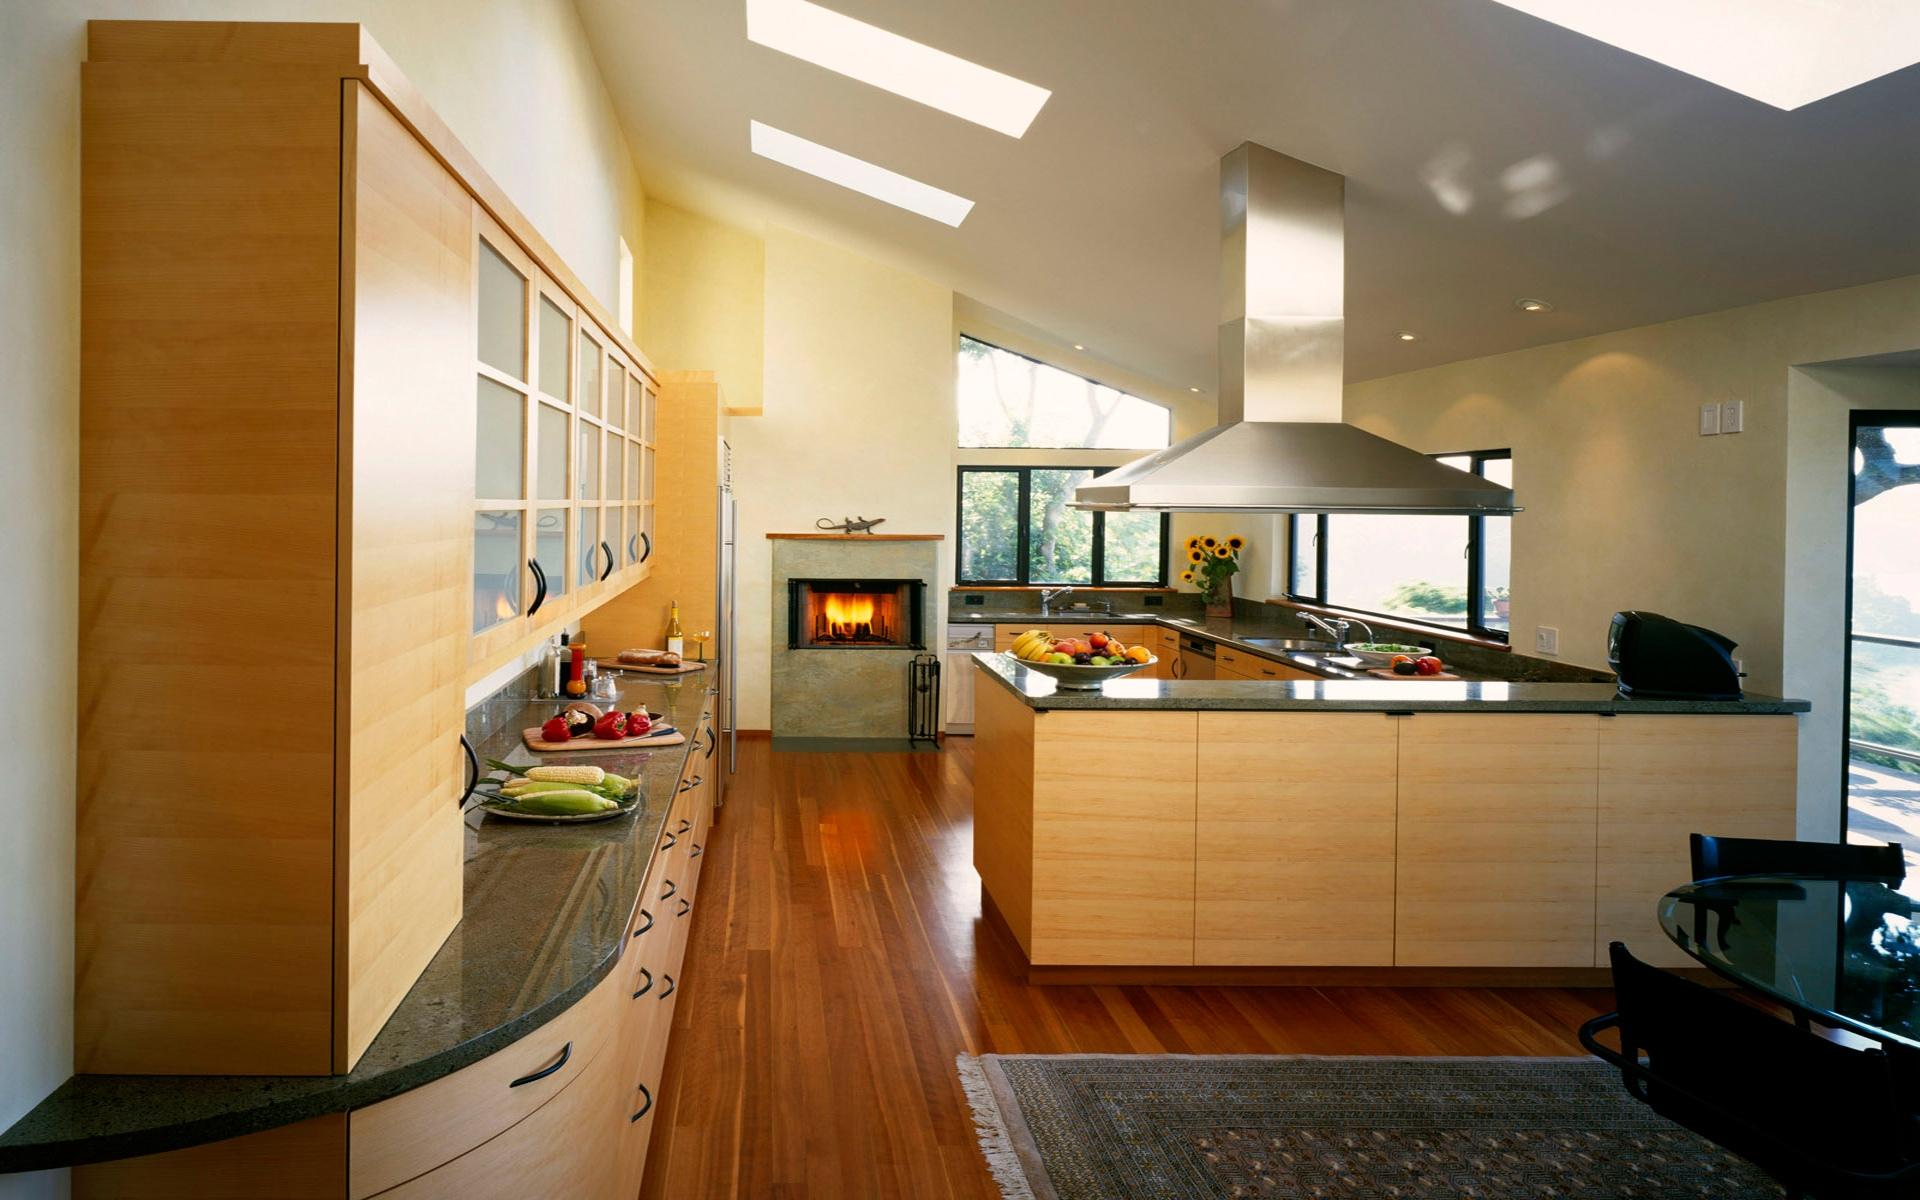 Fondos de pantalla : comida, habitación, interior, Fruta, cocina ...